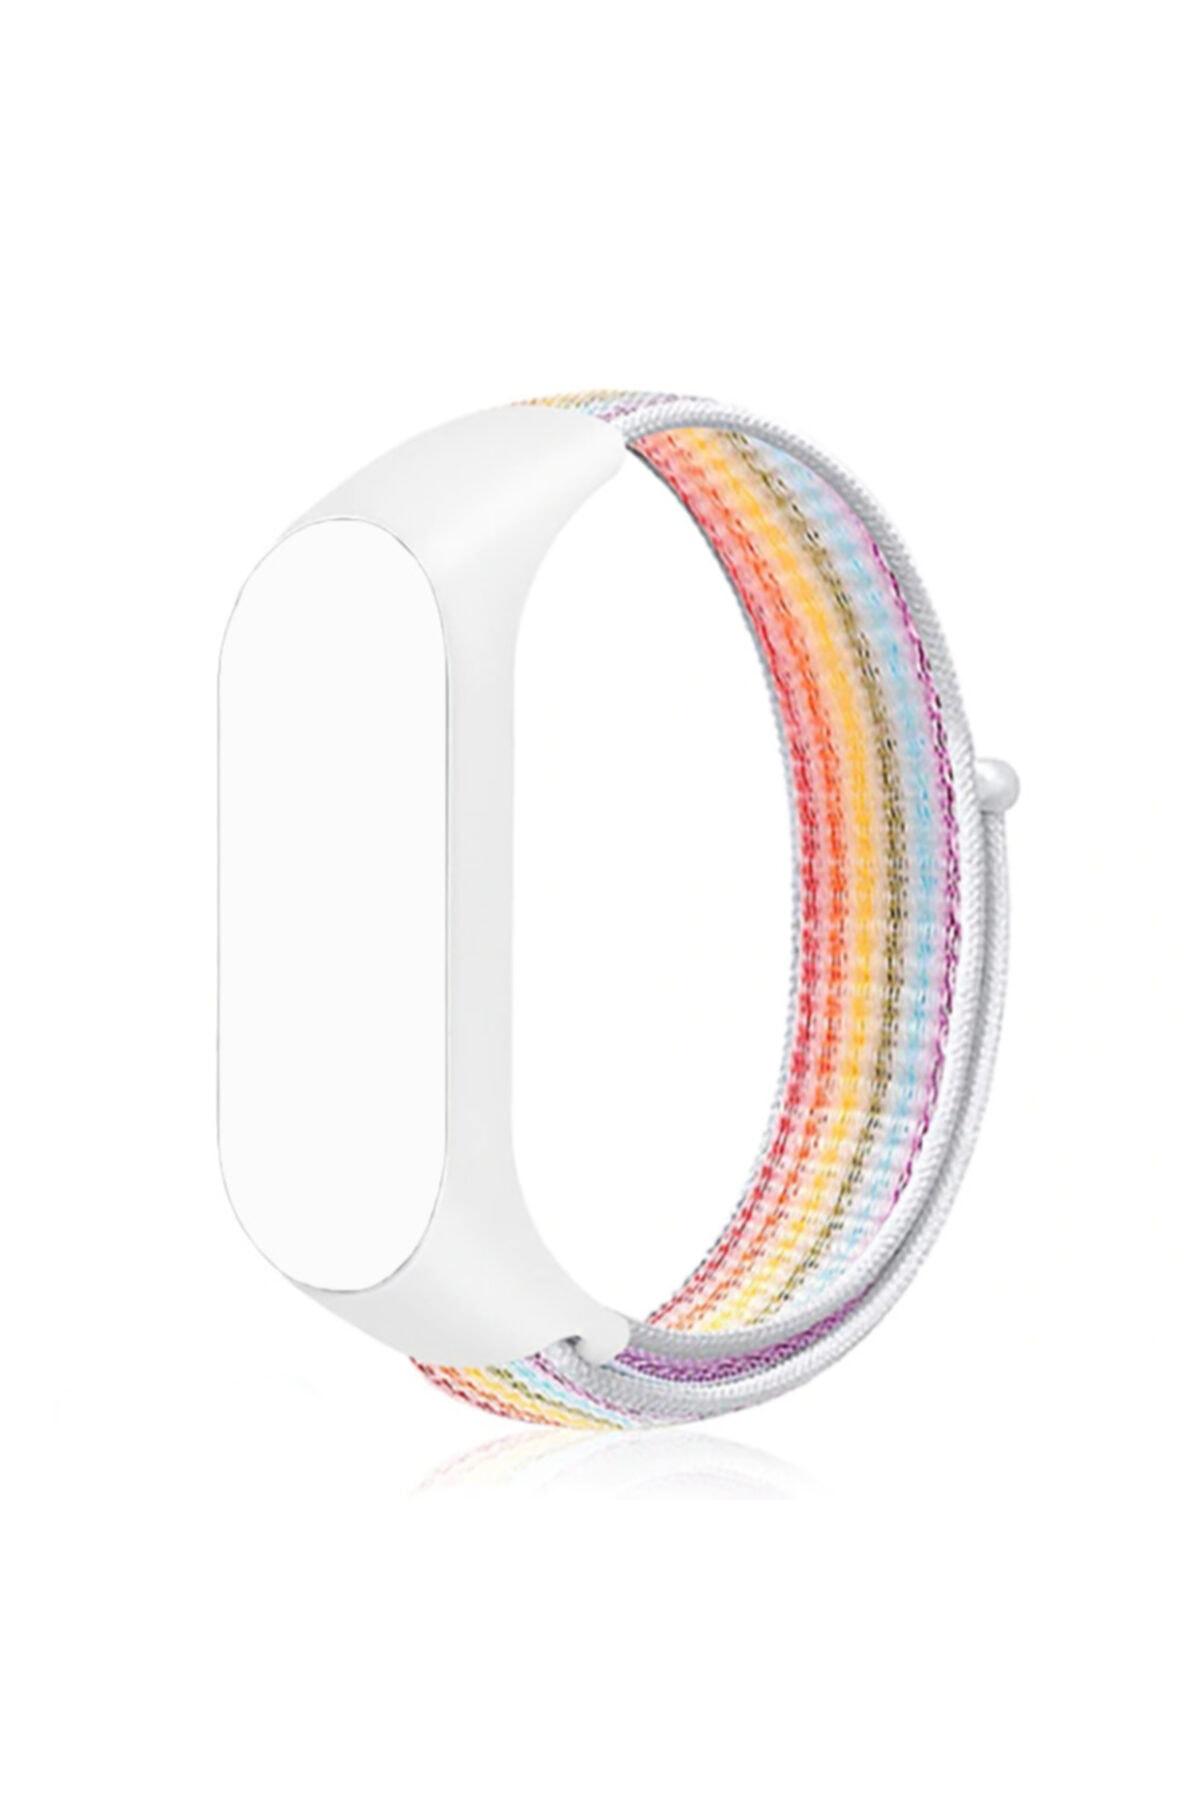 zore Xiaomi Mi Band 2 Kordon Hasır Örgü Plastik Krd-03 1